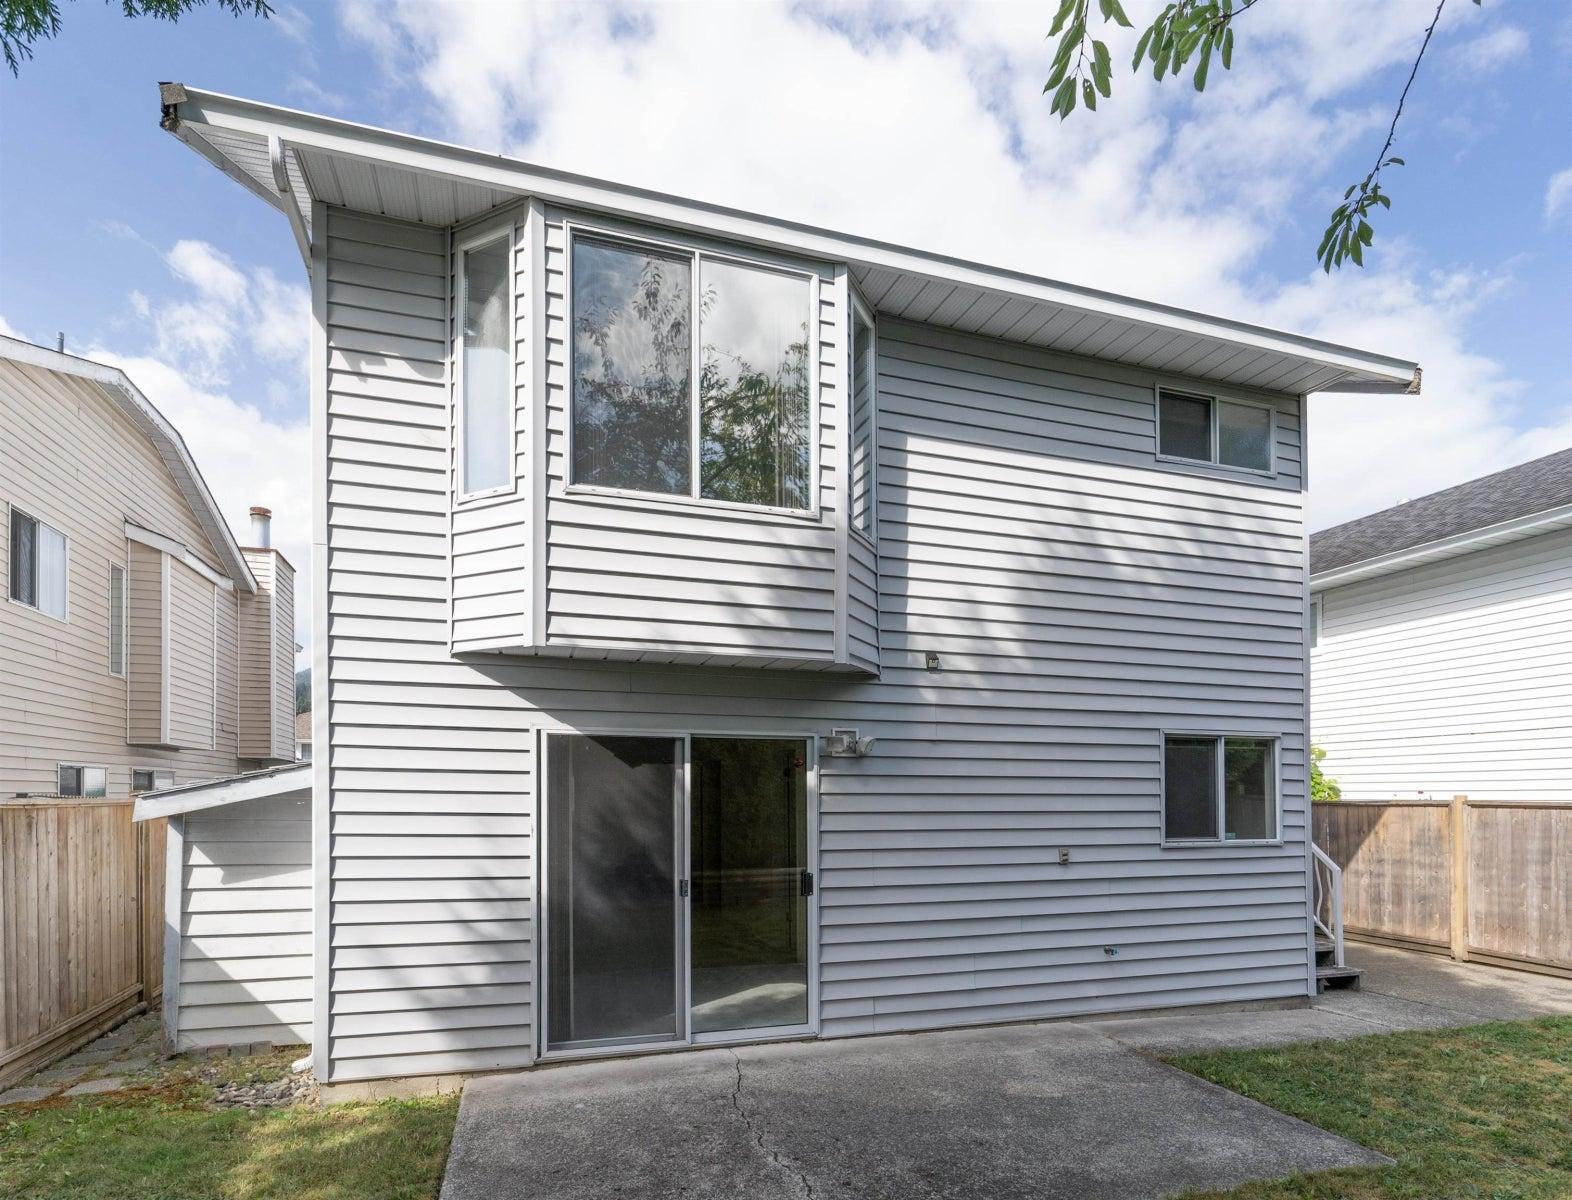 2556 RAVEN COURT - Eagle Ridge CQ House/Single Family for sale, 4 Bedrooms (R2611826) #35